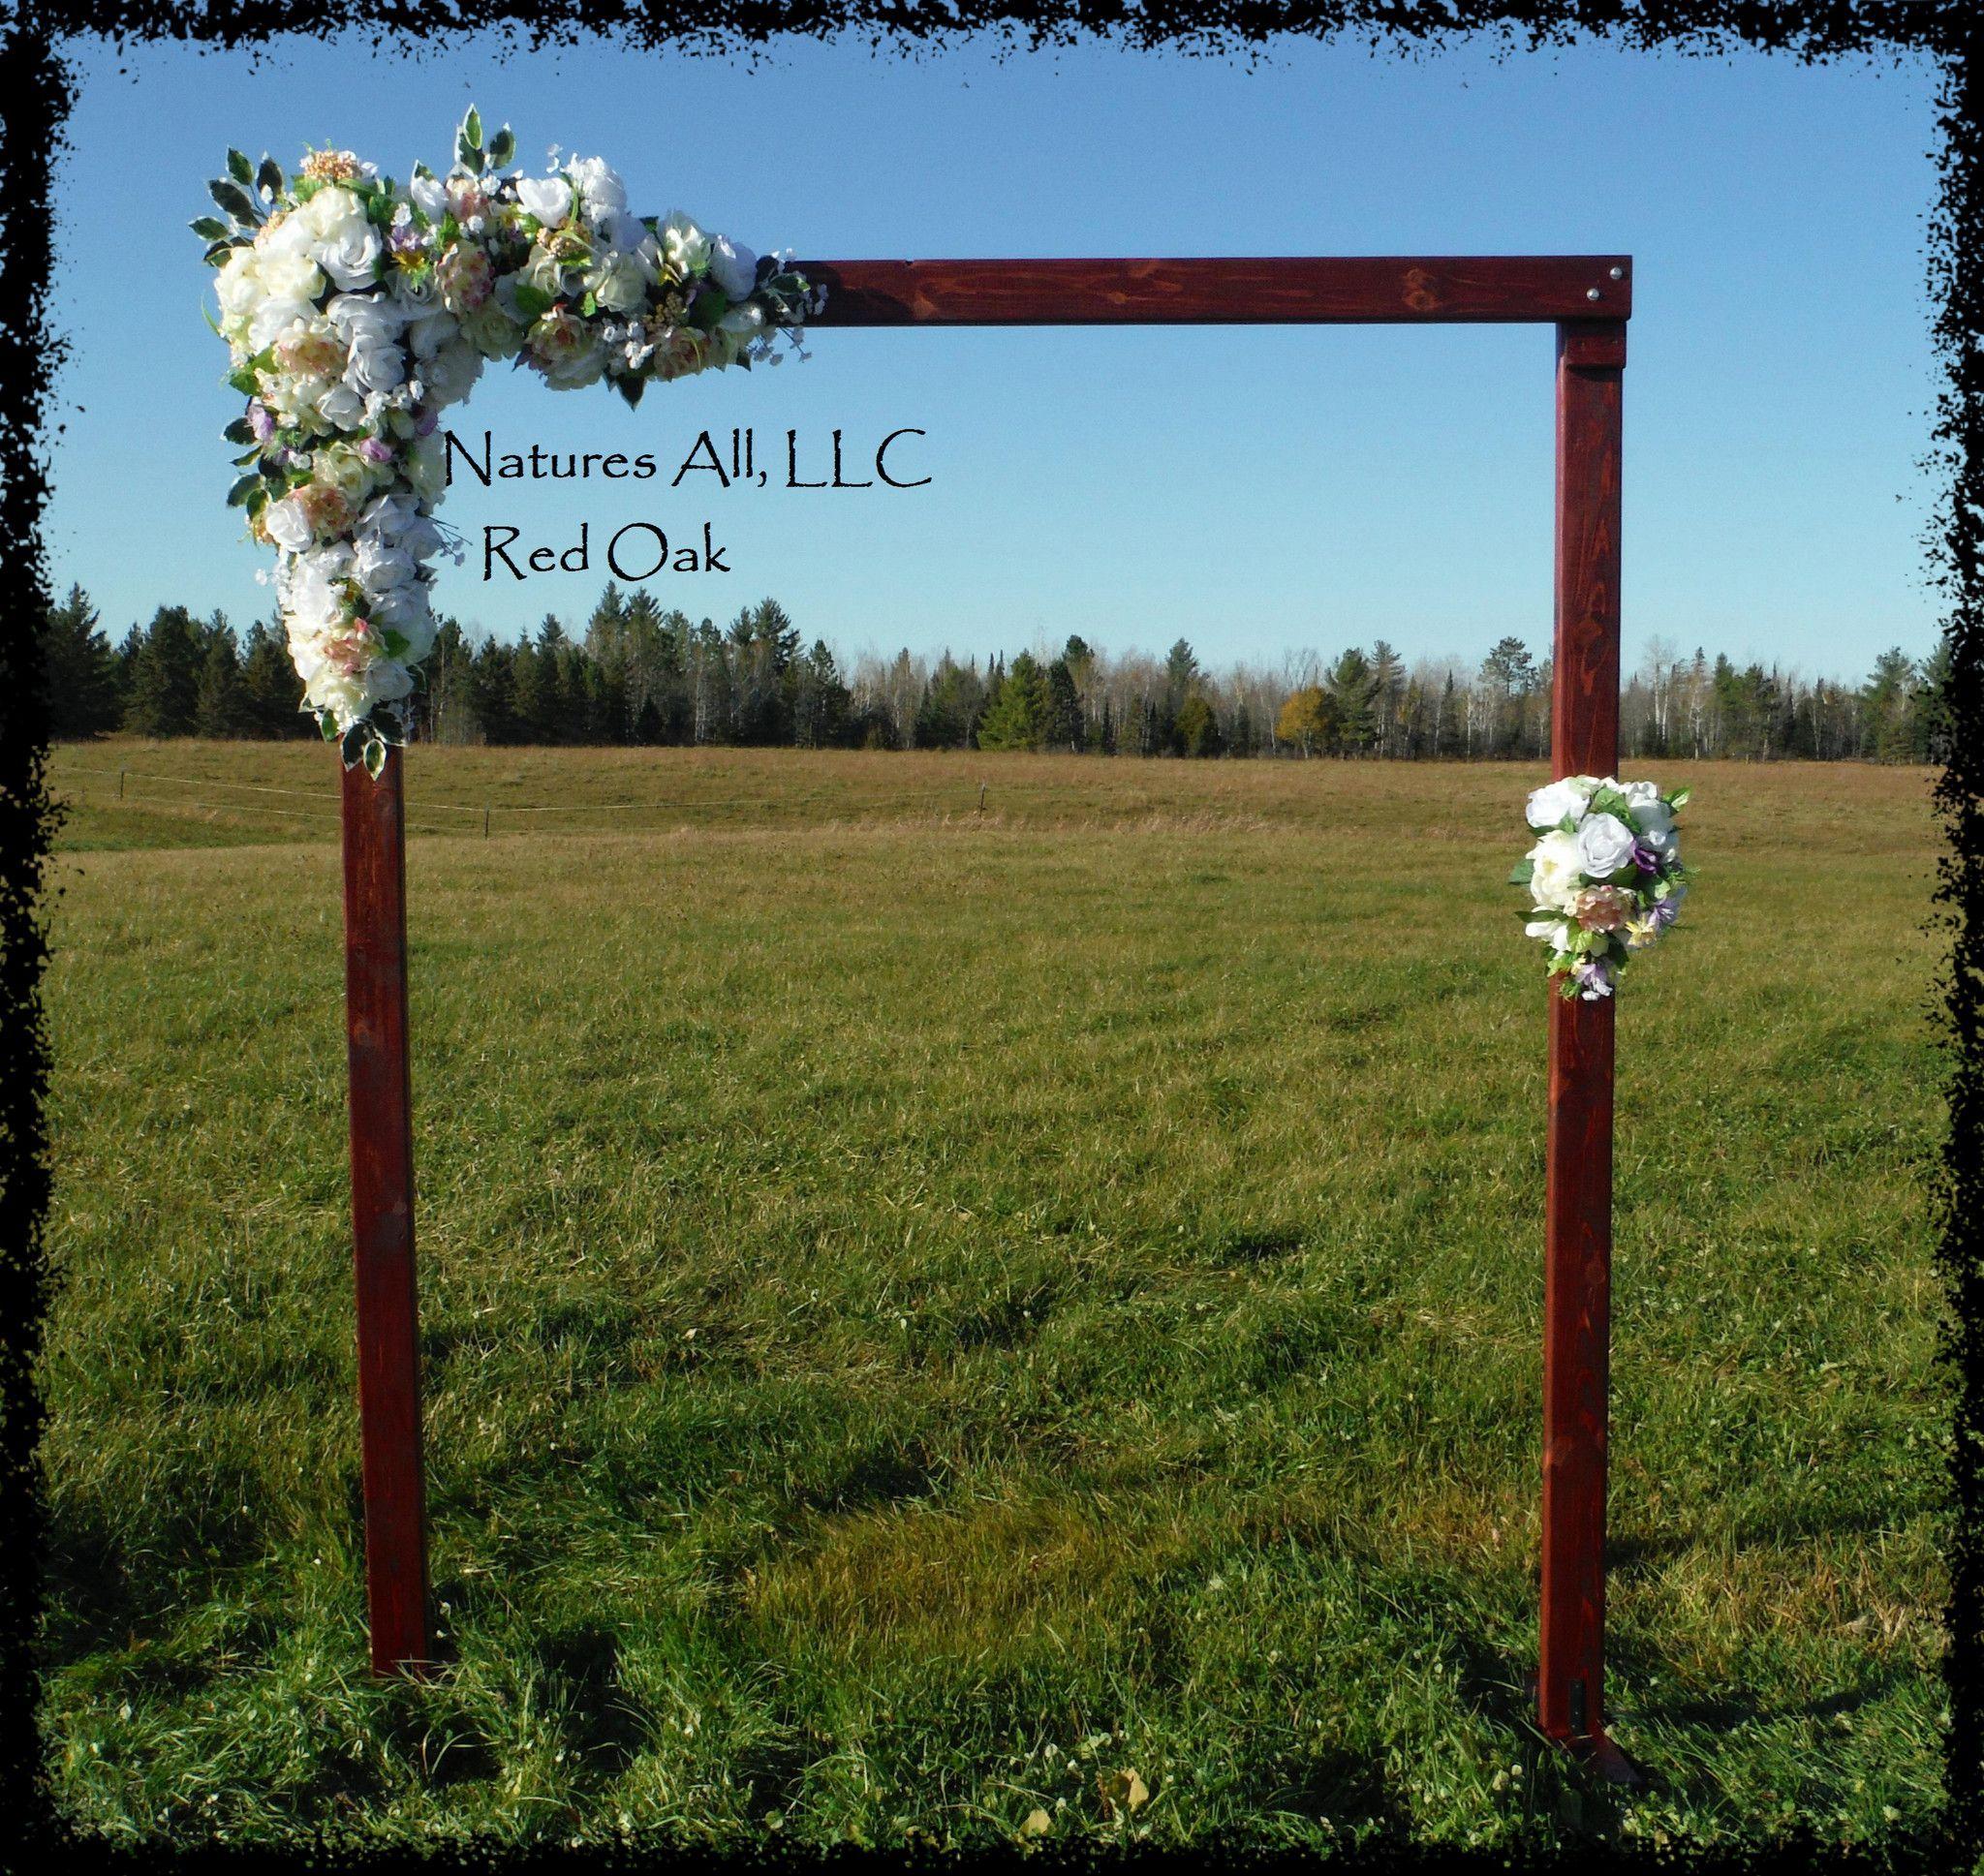 Oak Arbor Church: Rustic Outdoor Wedding Ideas/Country Wedding Decor/Rustic